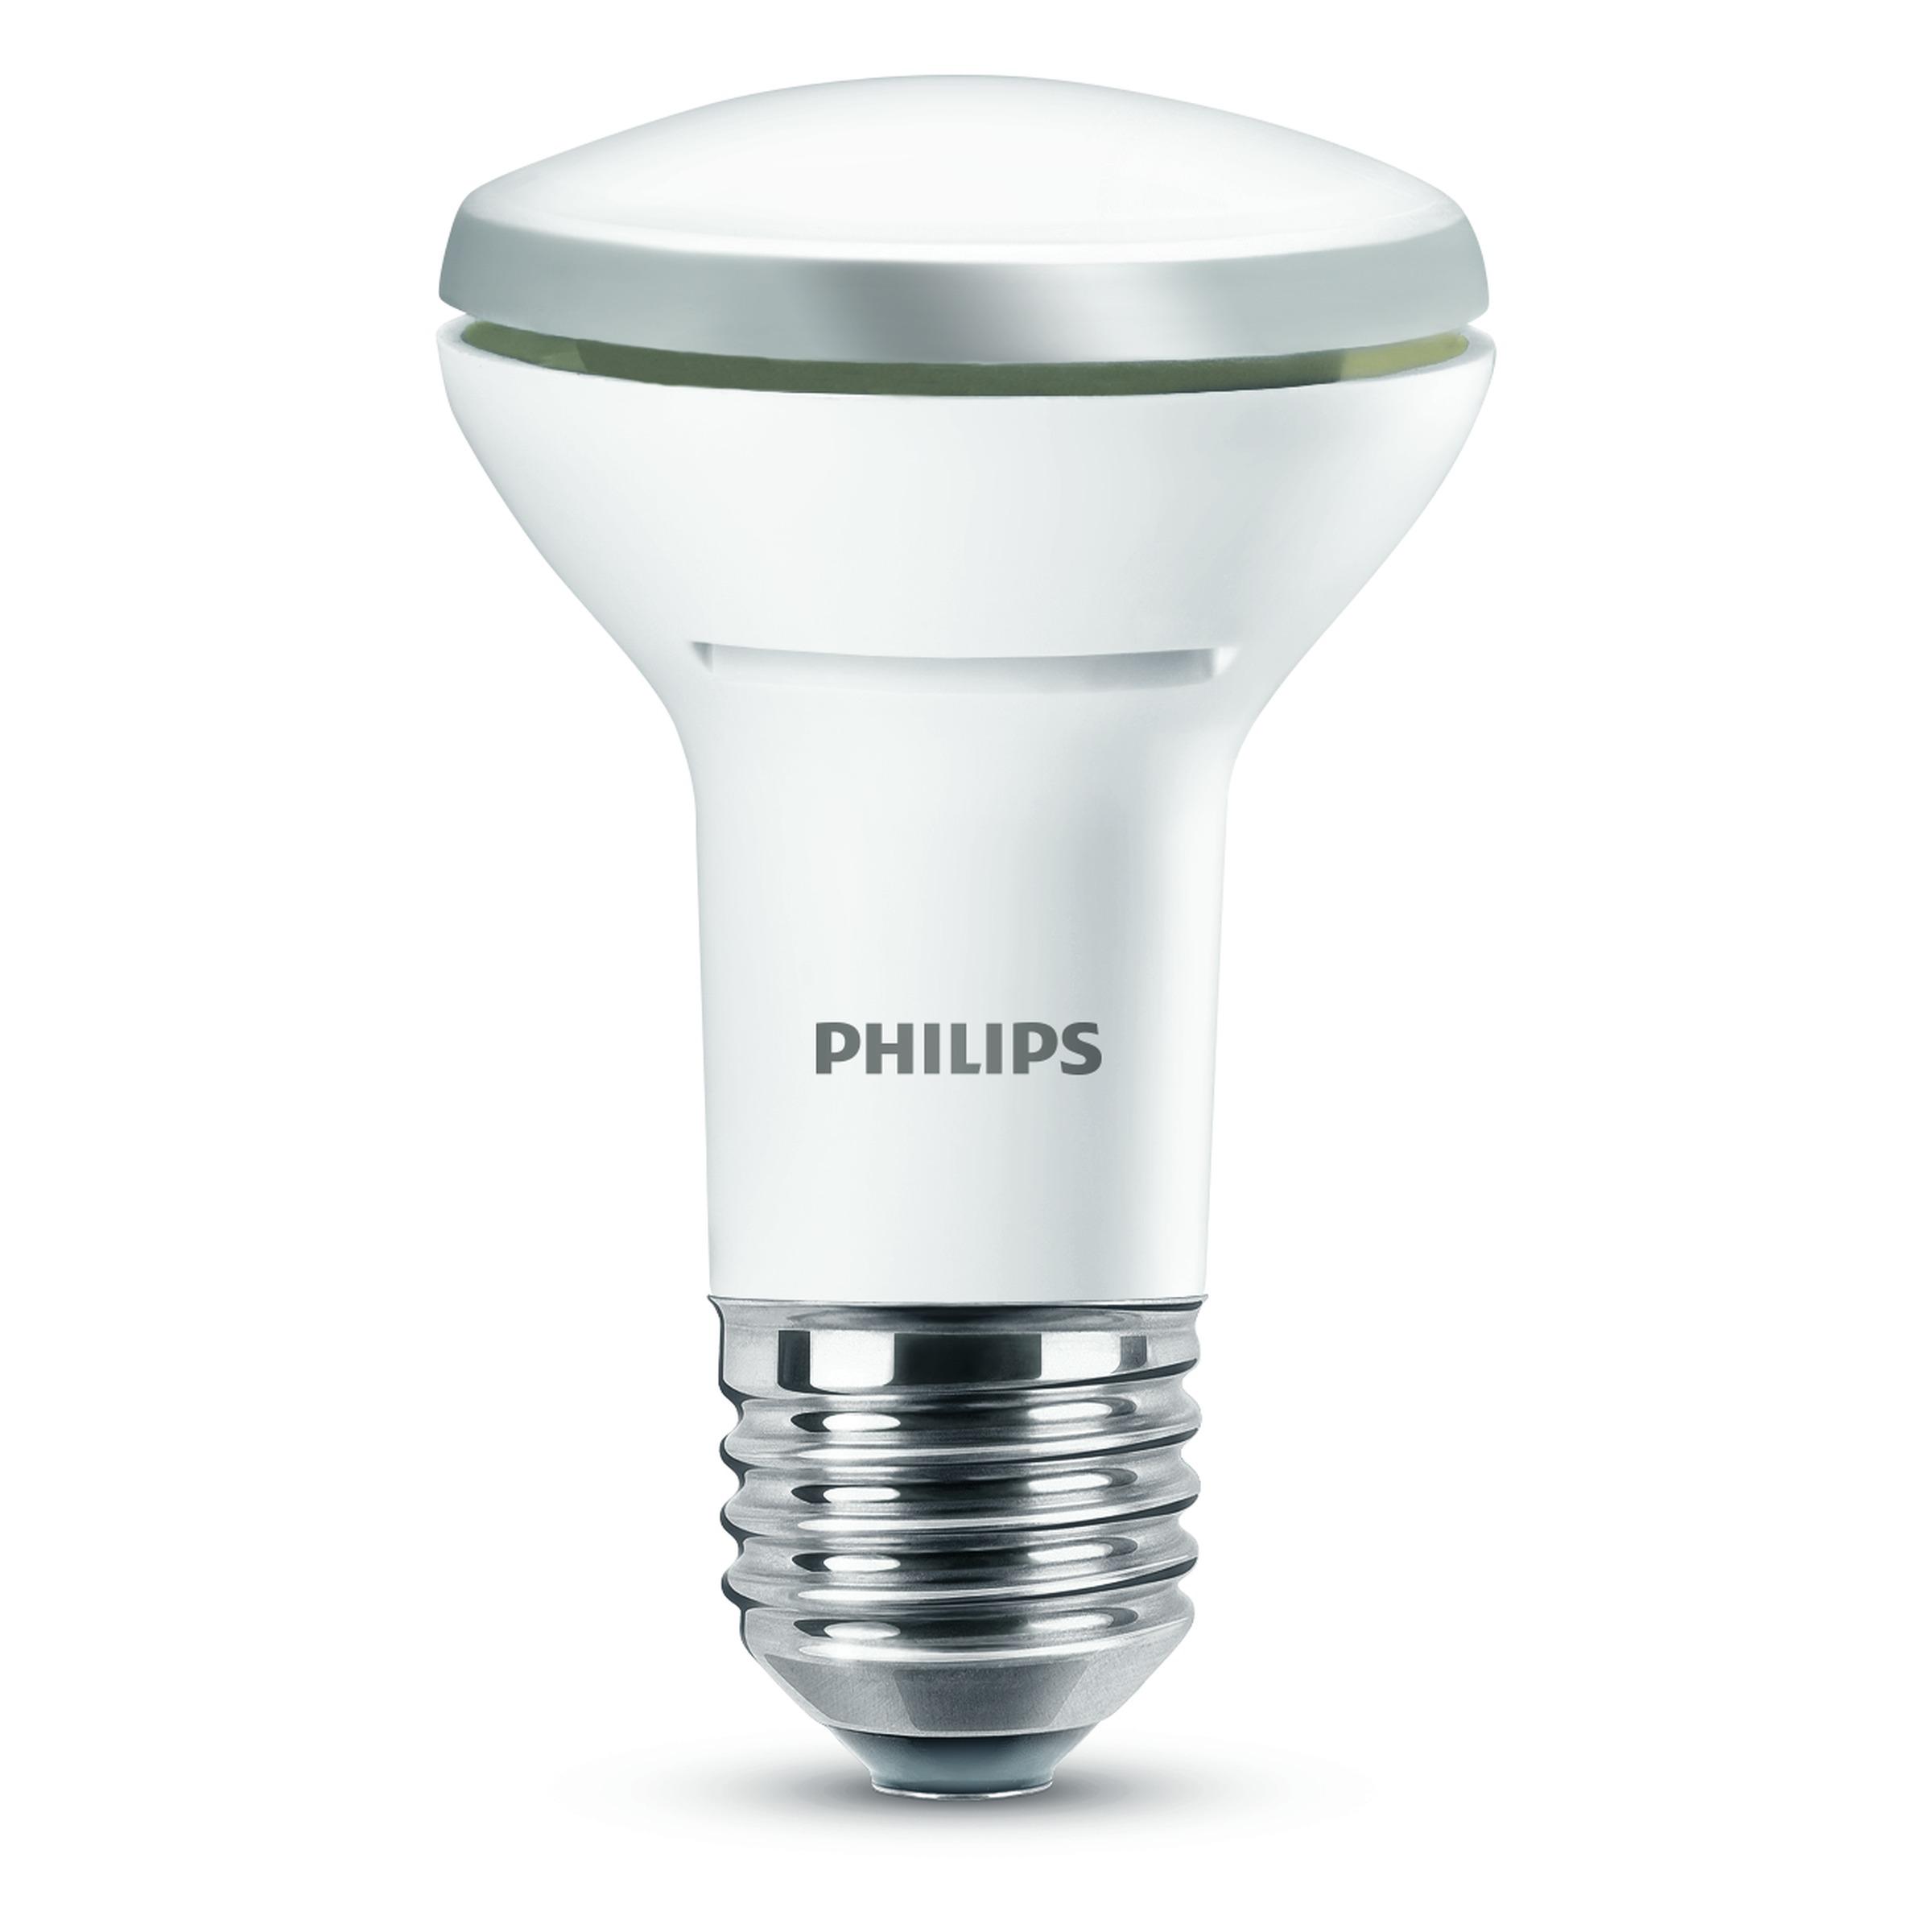 philips led reflectorlamp e27 345 lumen 5 7w 60w dimbaar. Black Bedroom Furniture Sets. Home Design Ideas